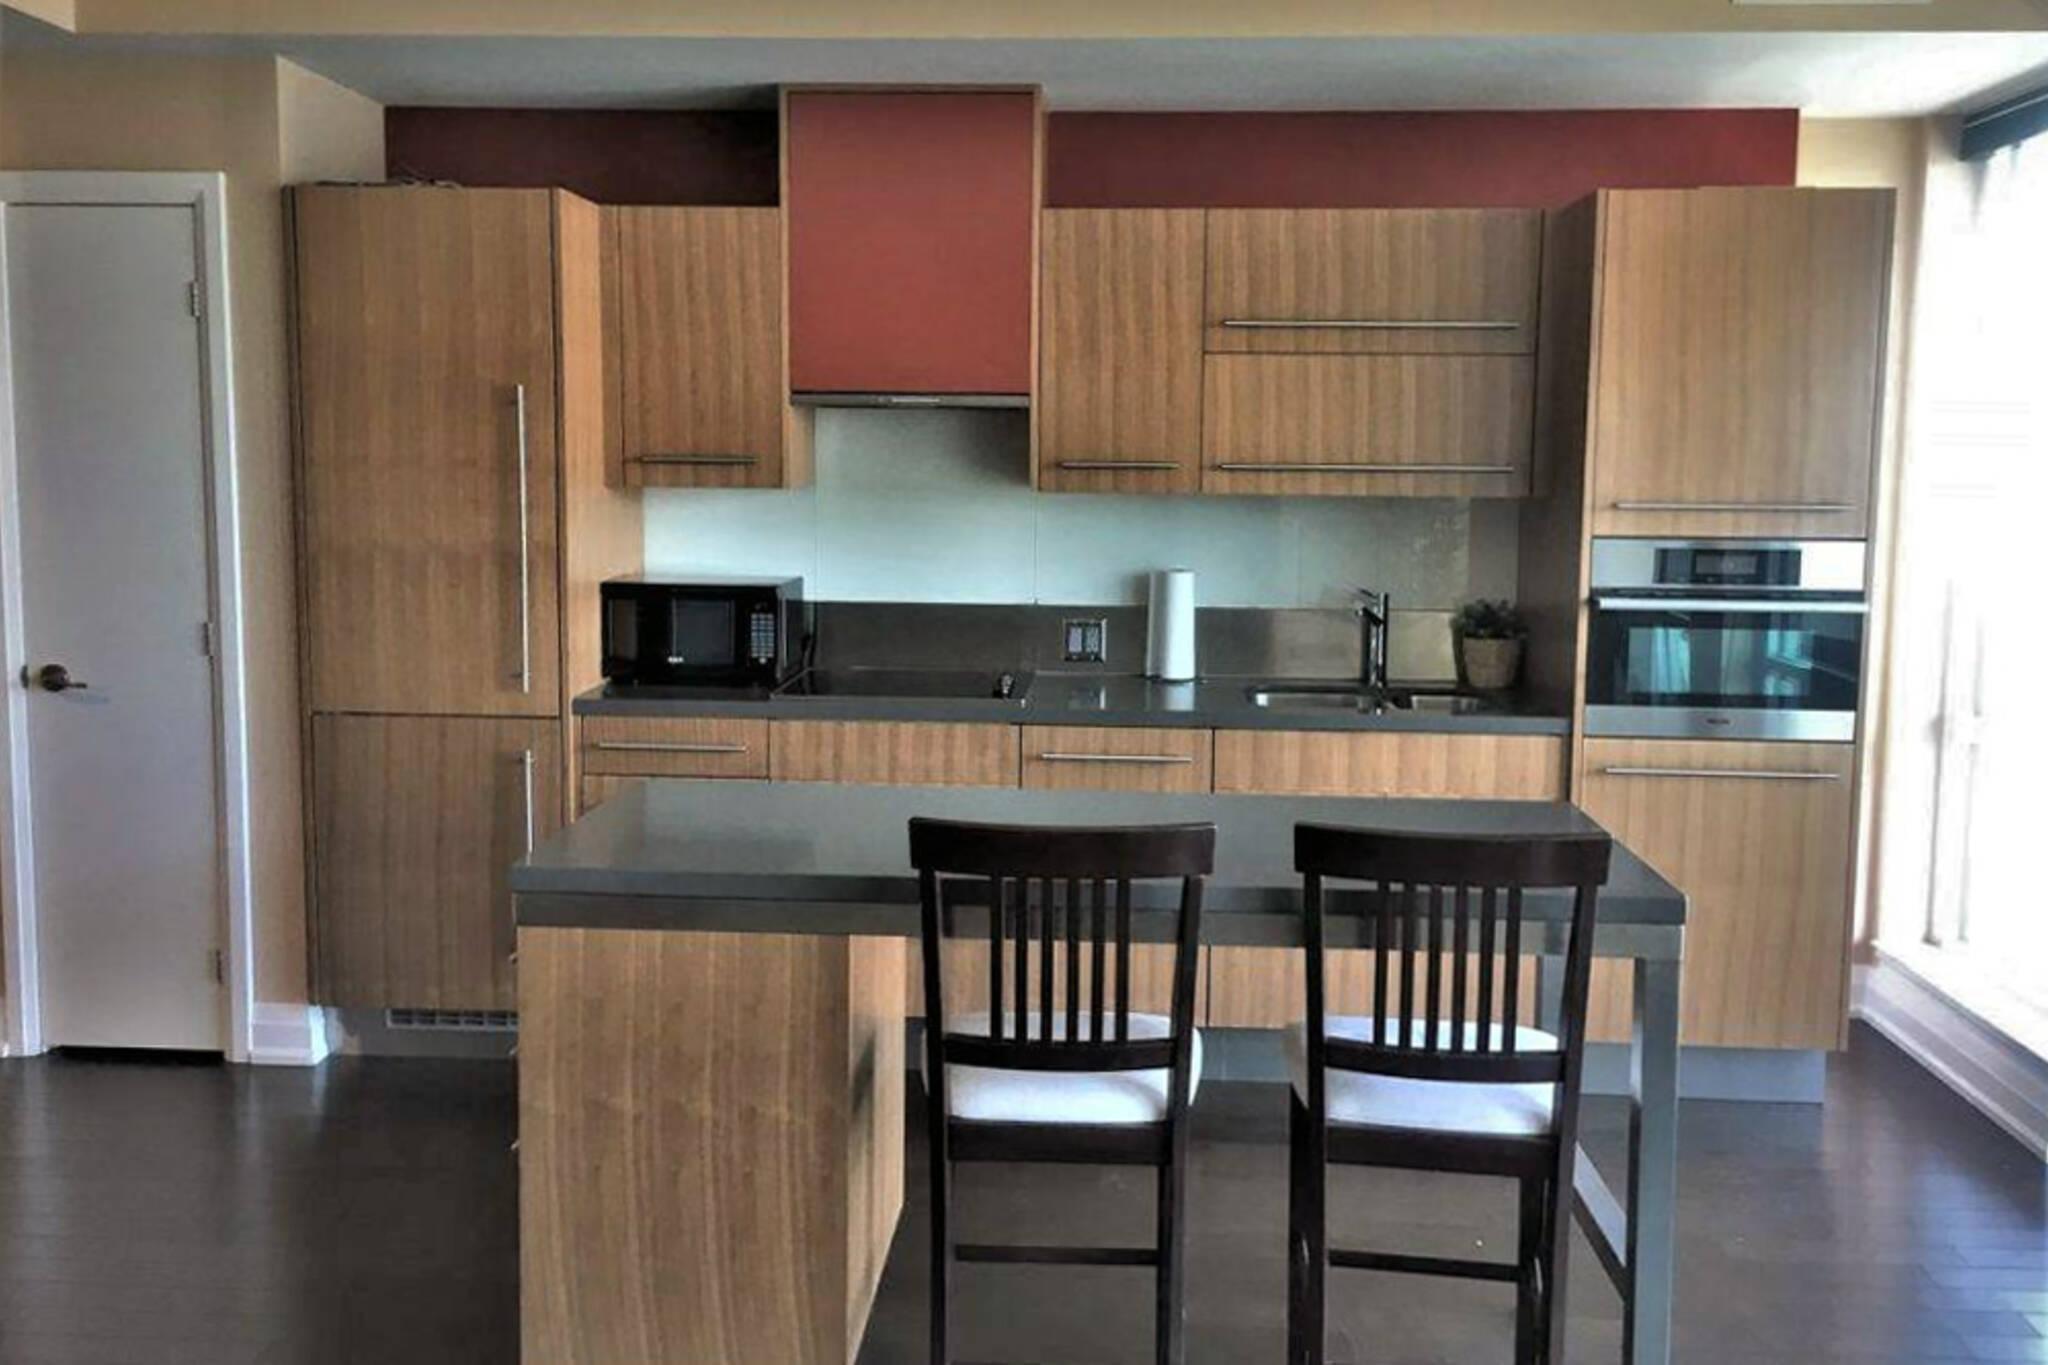 toronto apartment comparison